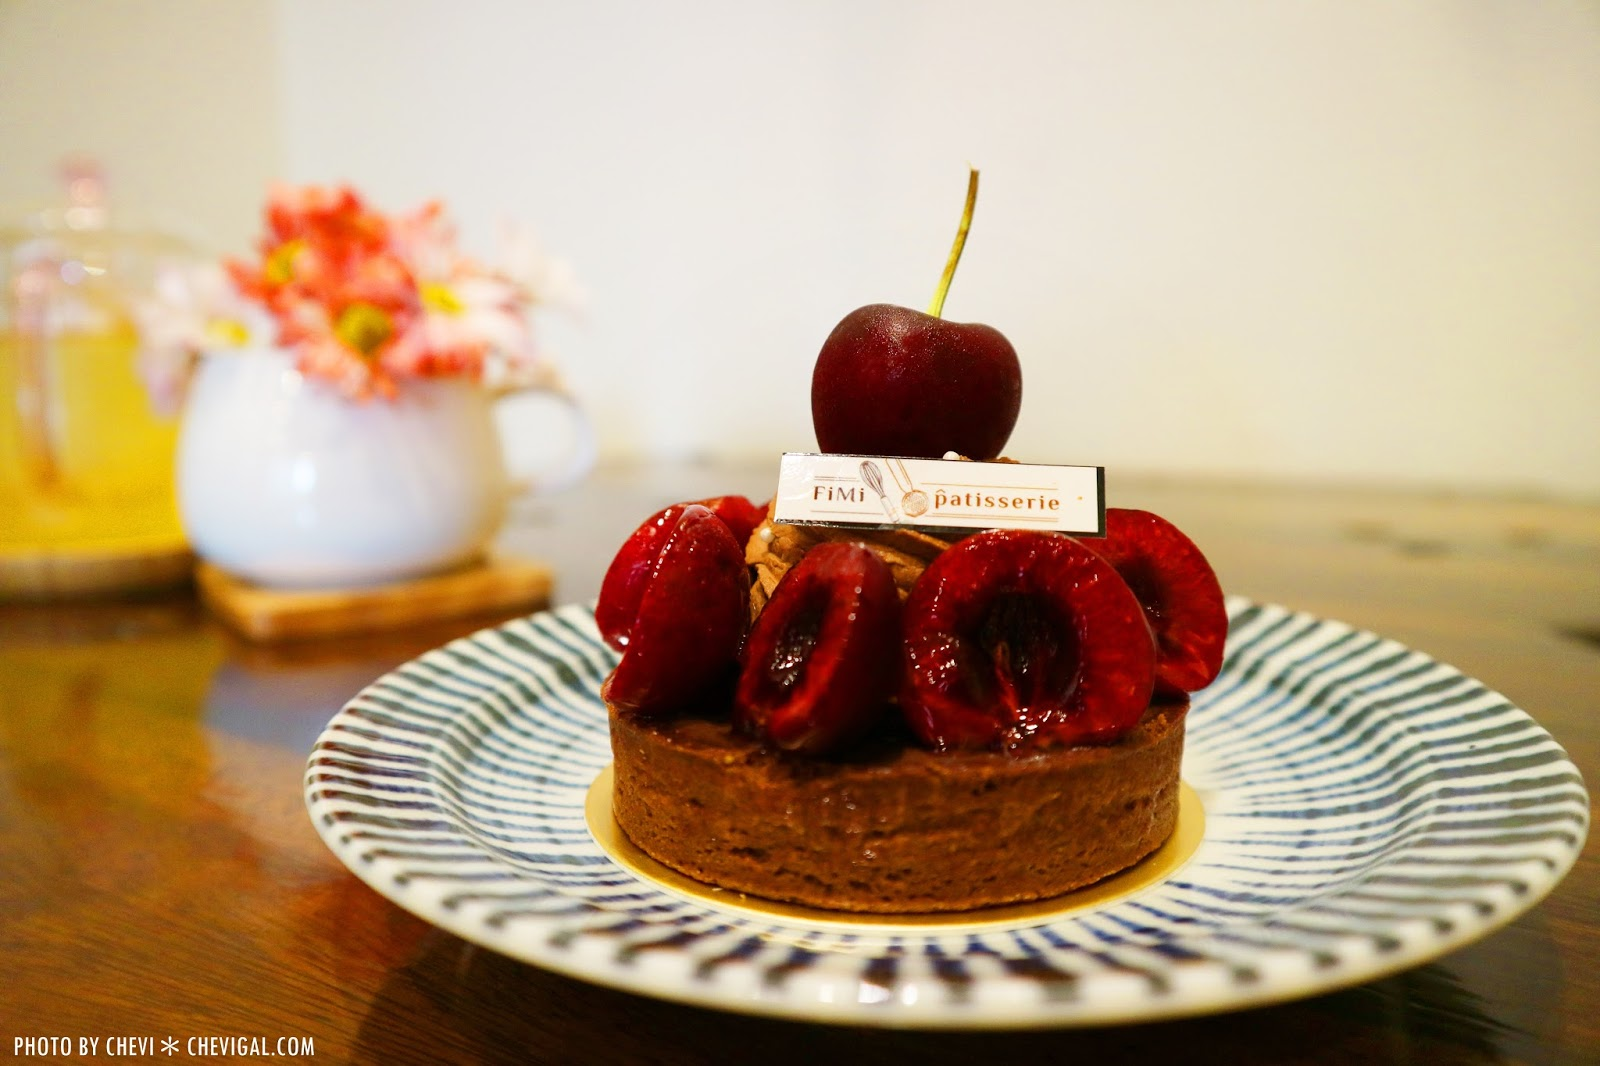 IMG 9554 - 台中烏日│FiMi 小後山廚房。新鮮手作法式甜點。森林清新風格好放鬆